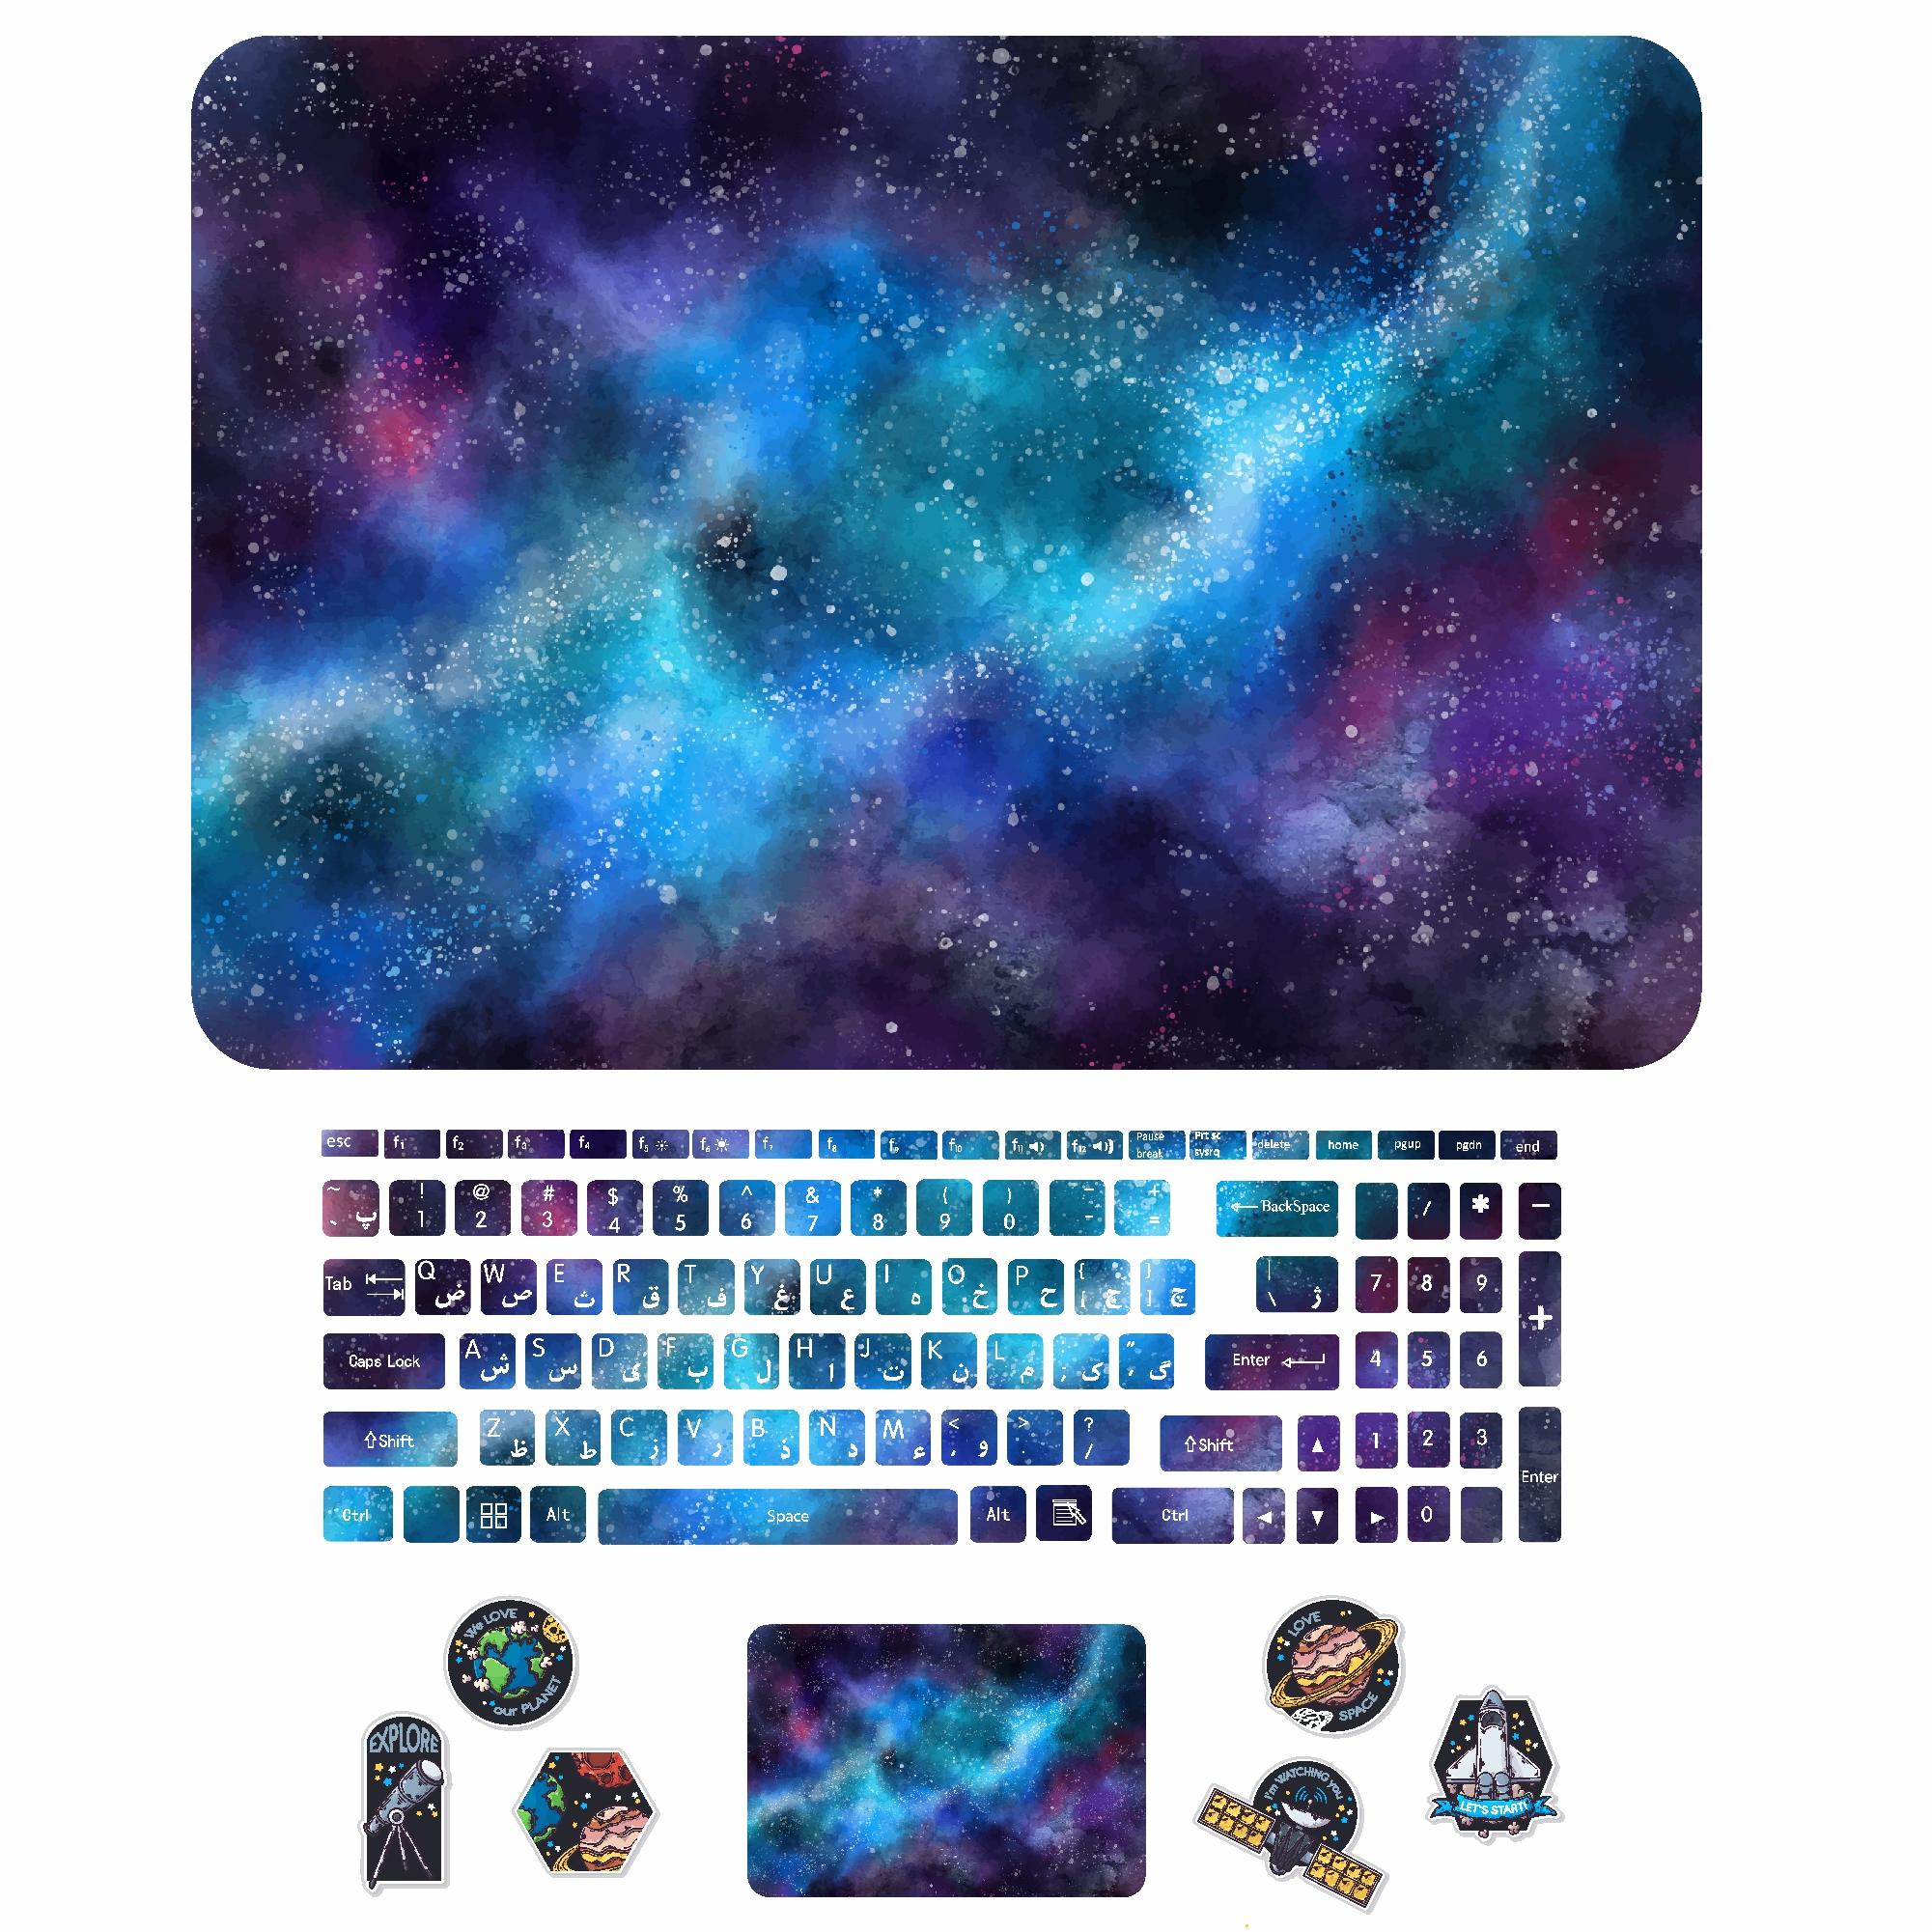 استیکر لپ تاپ کد sp-ace02 به همراه برچسب حروف فارسی کیبورد